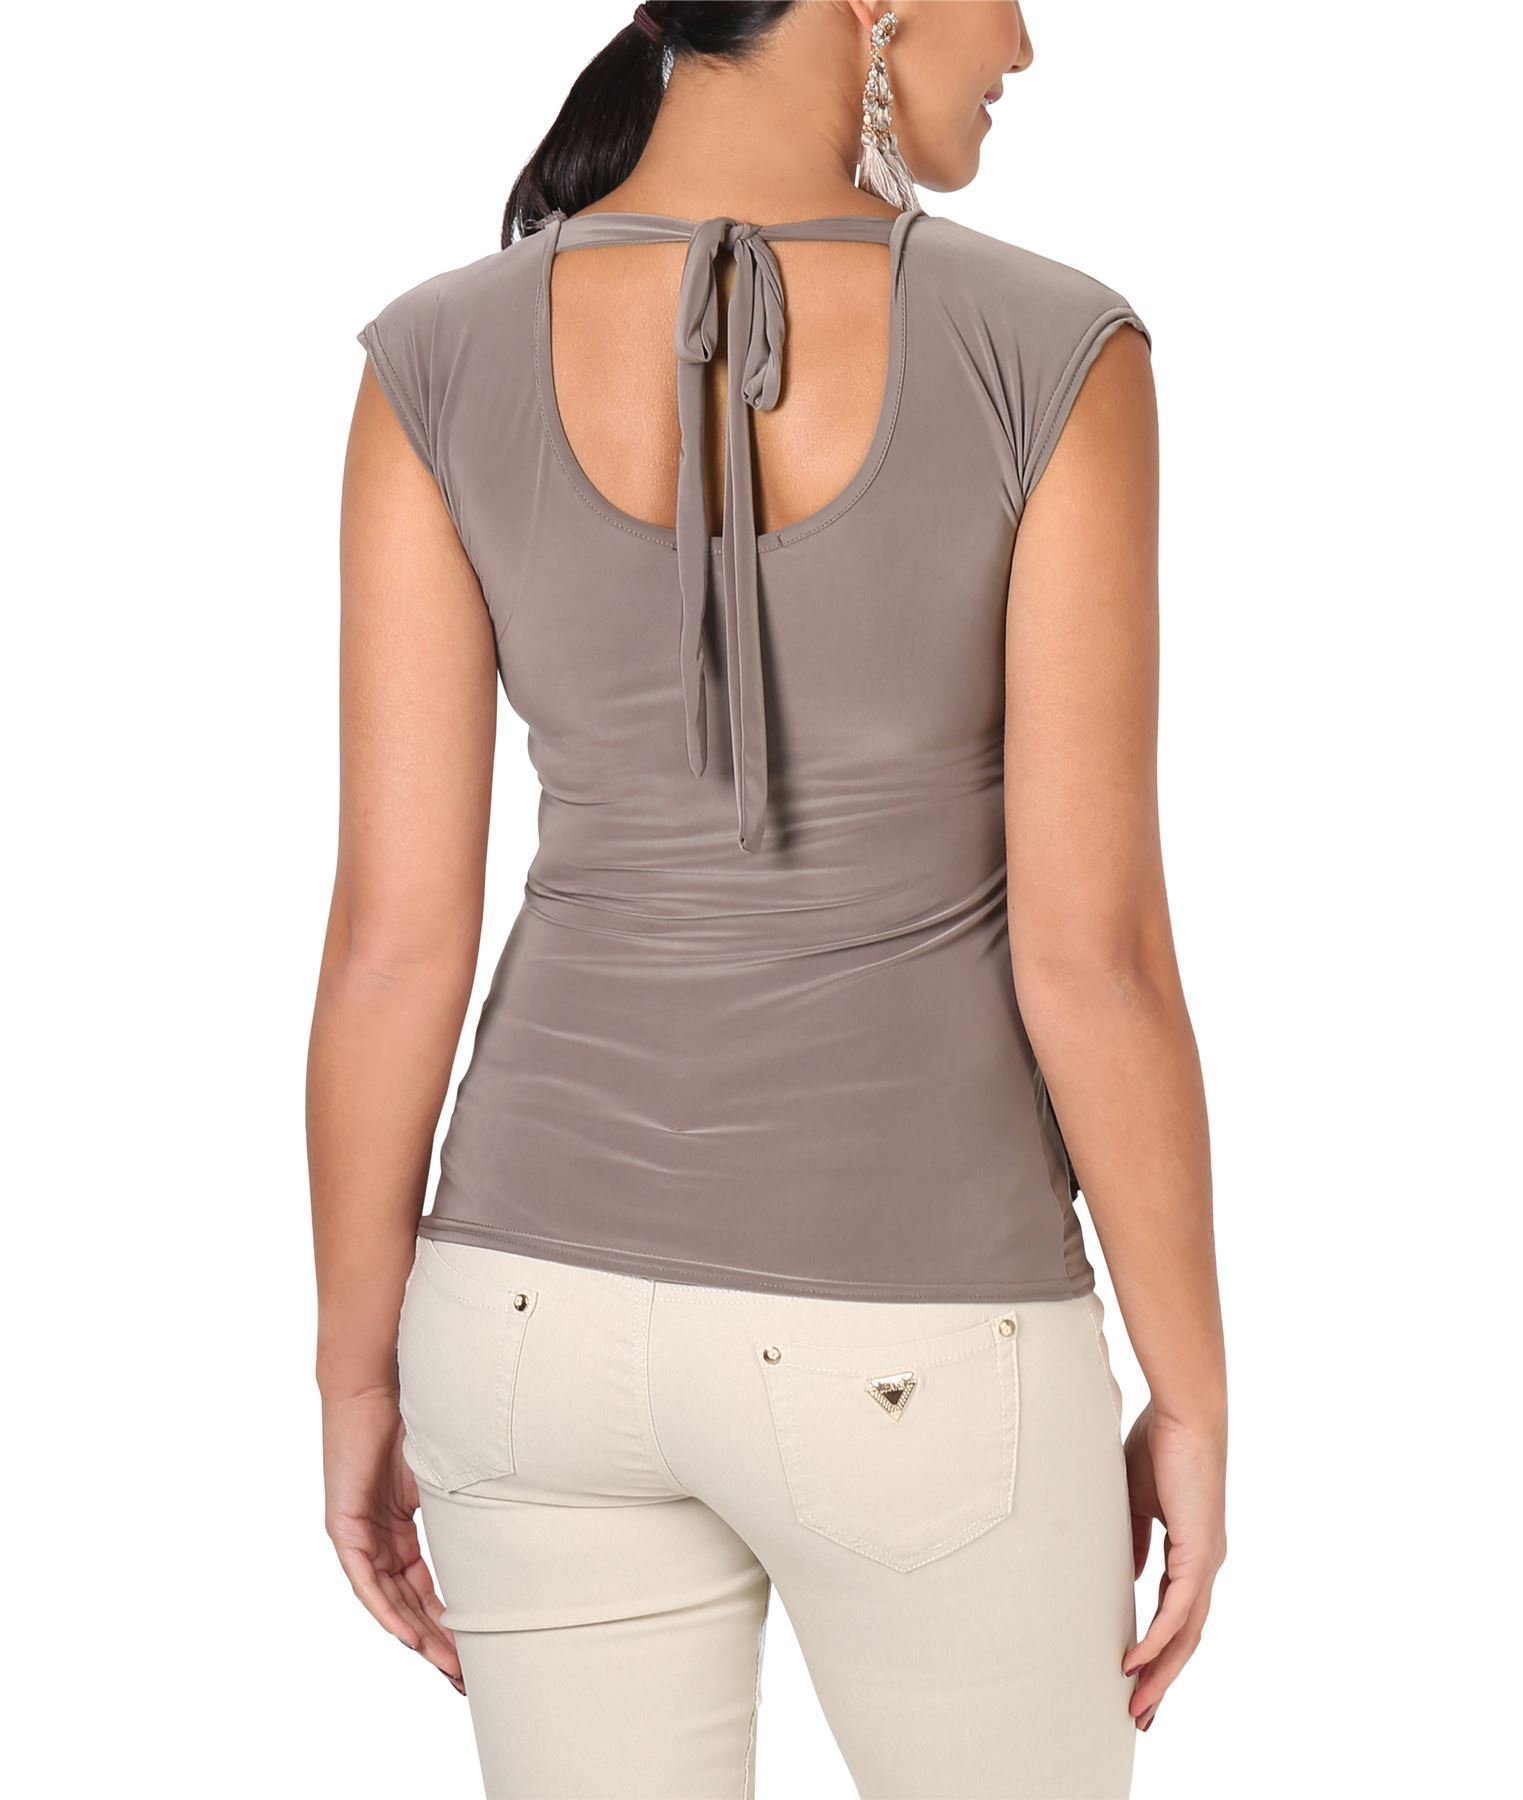 Womens-Ladies-Cowl-Neck-Top-Sleeveless-Silk-Drape-T-Shirt-Low-Cut-Back-Party thumbnail 12